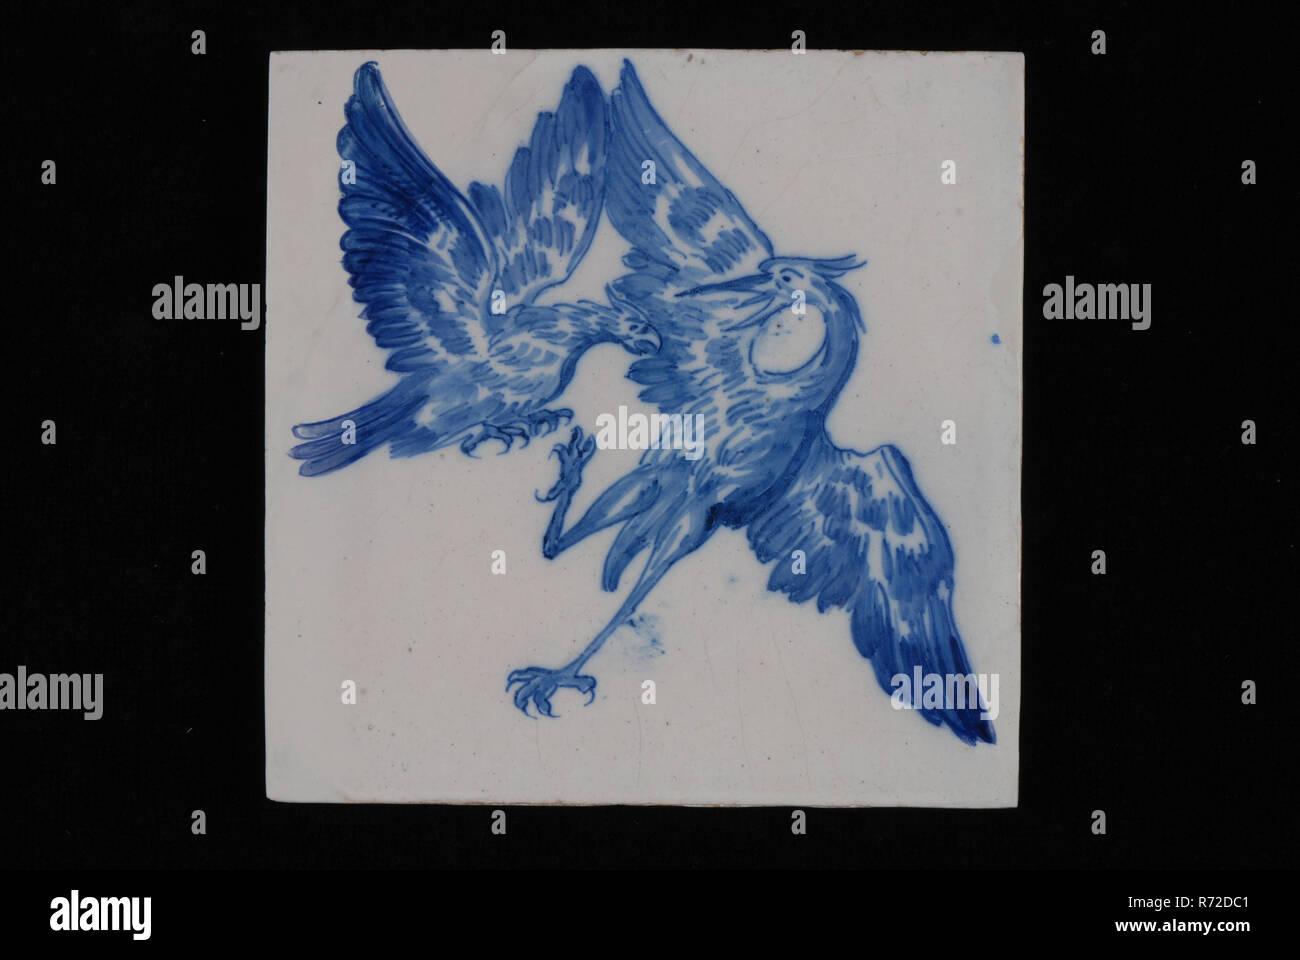 Jan Aalmis Sr Blau Weisse Fliesen Mit Falcon Angreifenden Heron